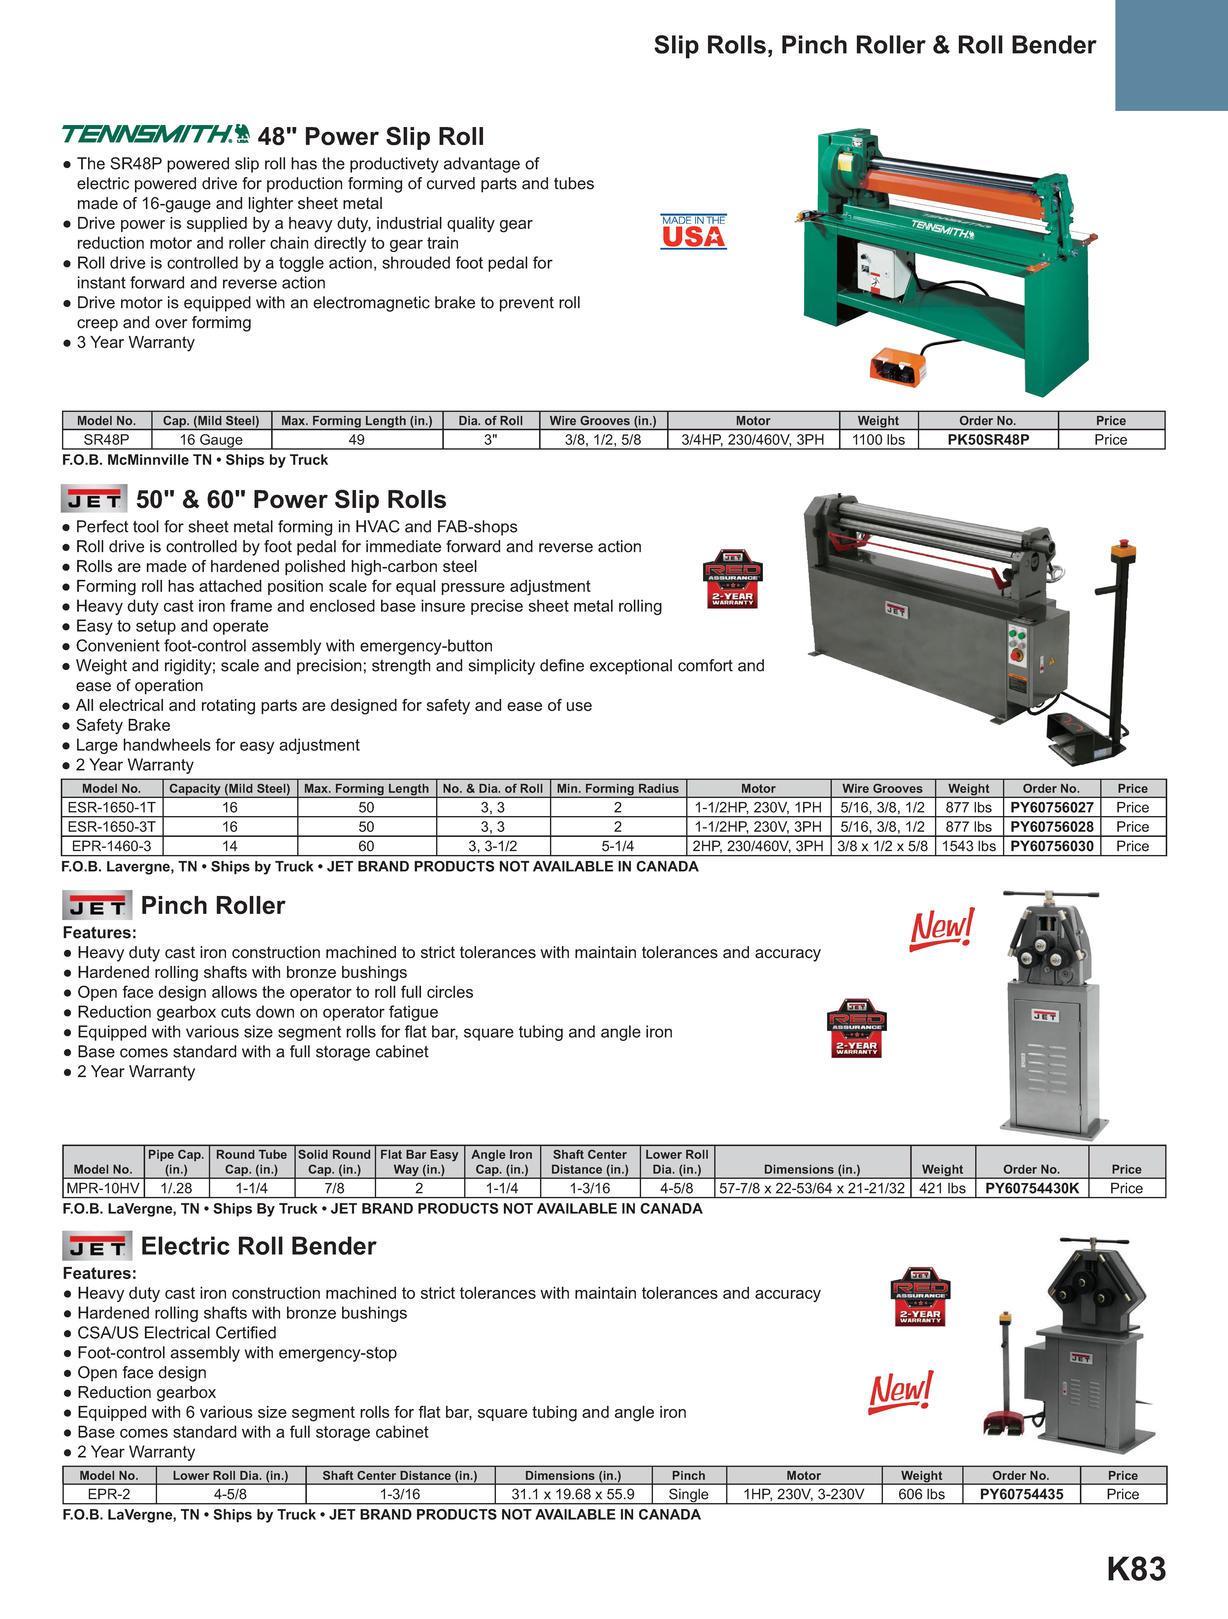 2019 Master Catalog Page K83 - 2019 Master Catalog